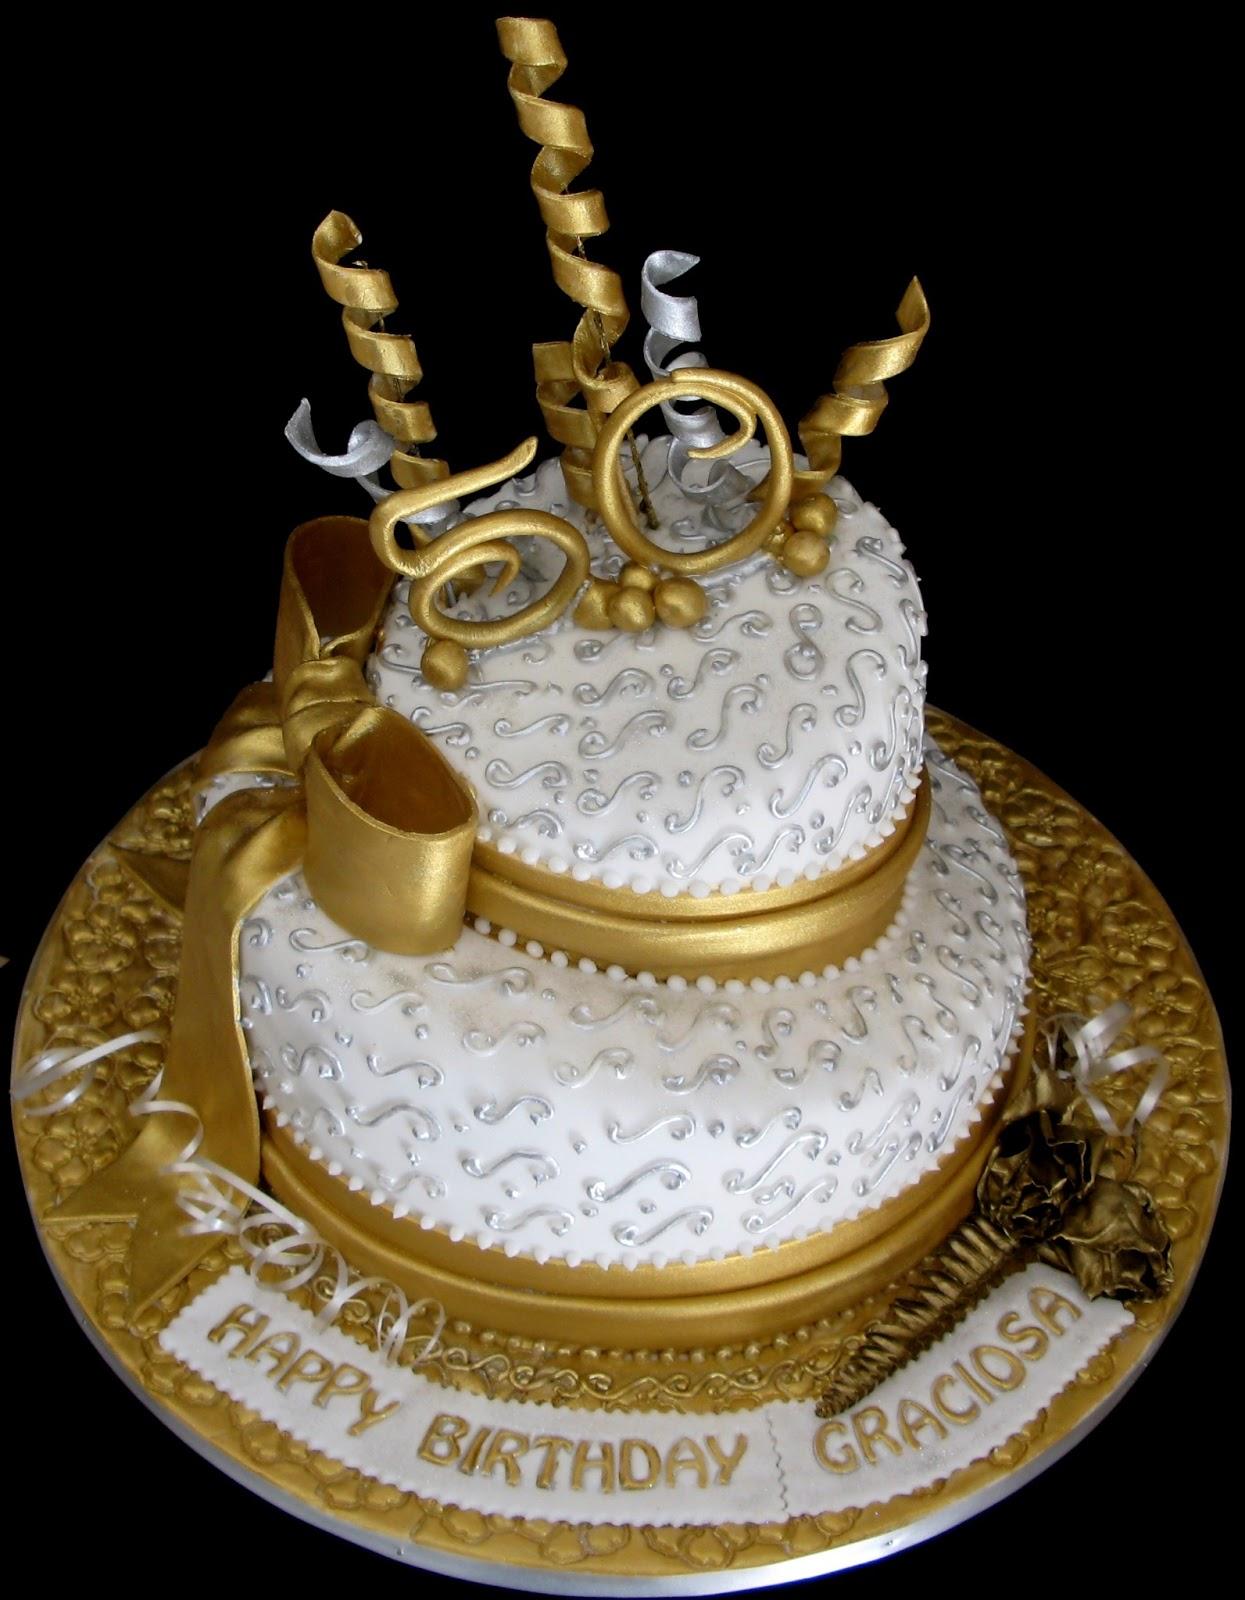 50 Year Old Cake Designs